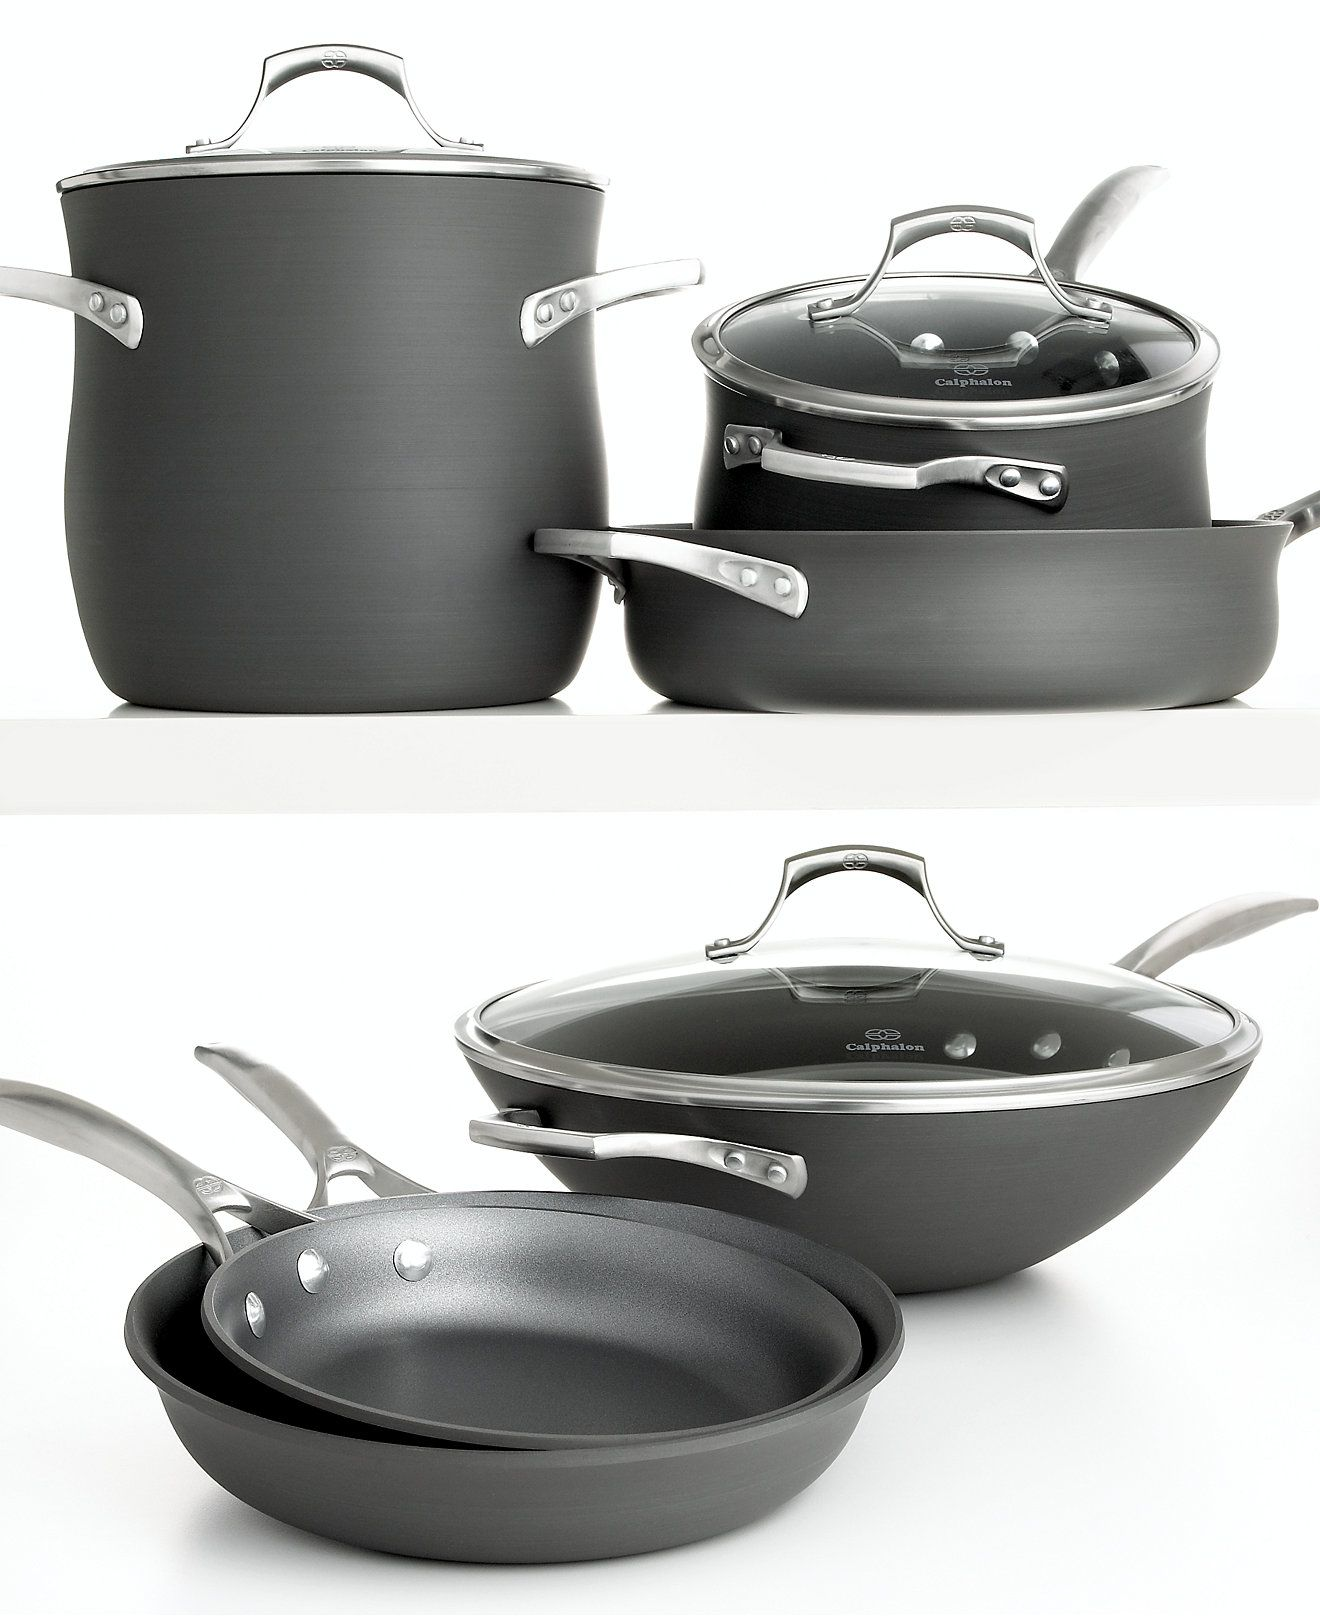 calphalon unison nonstick cookware cookware kitchen macyu0027s bridal and wedding registry